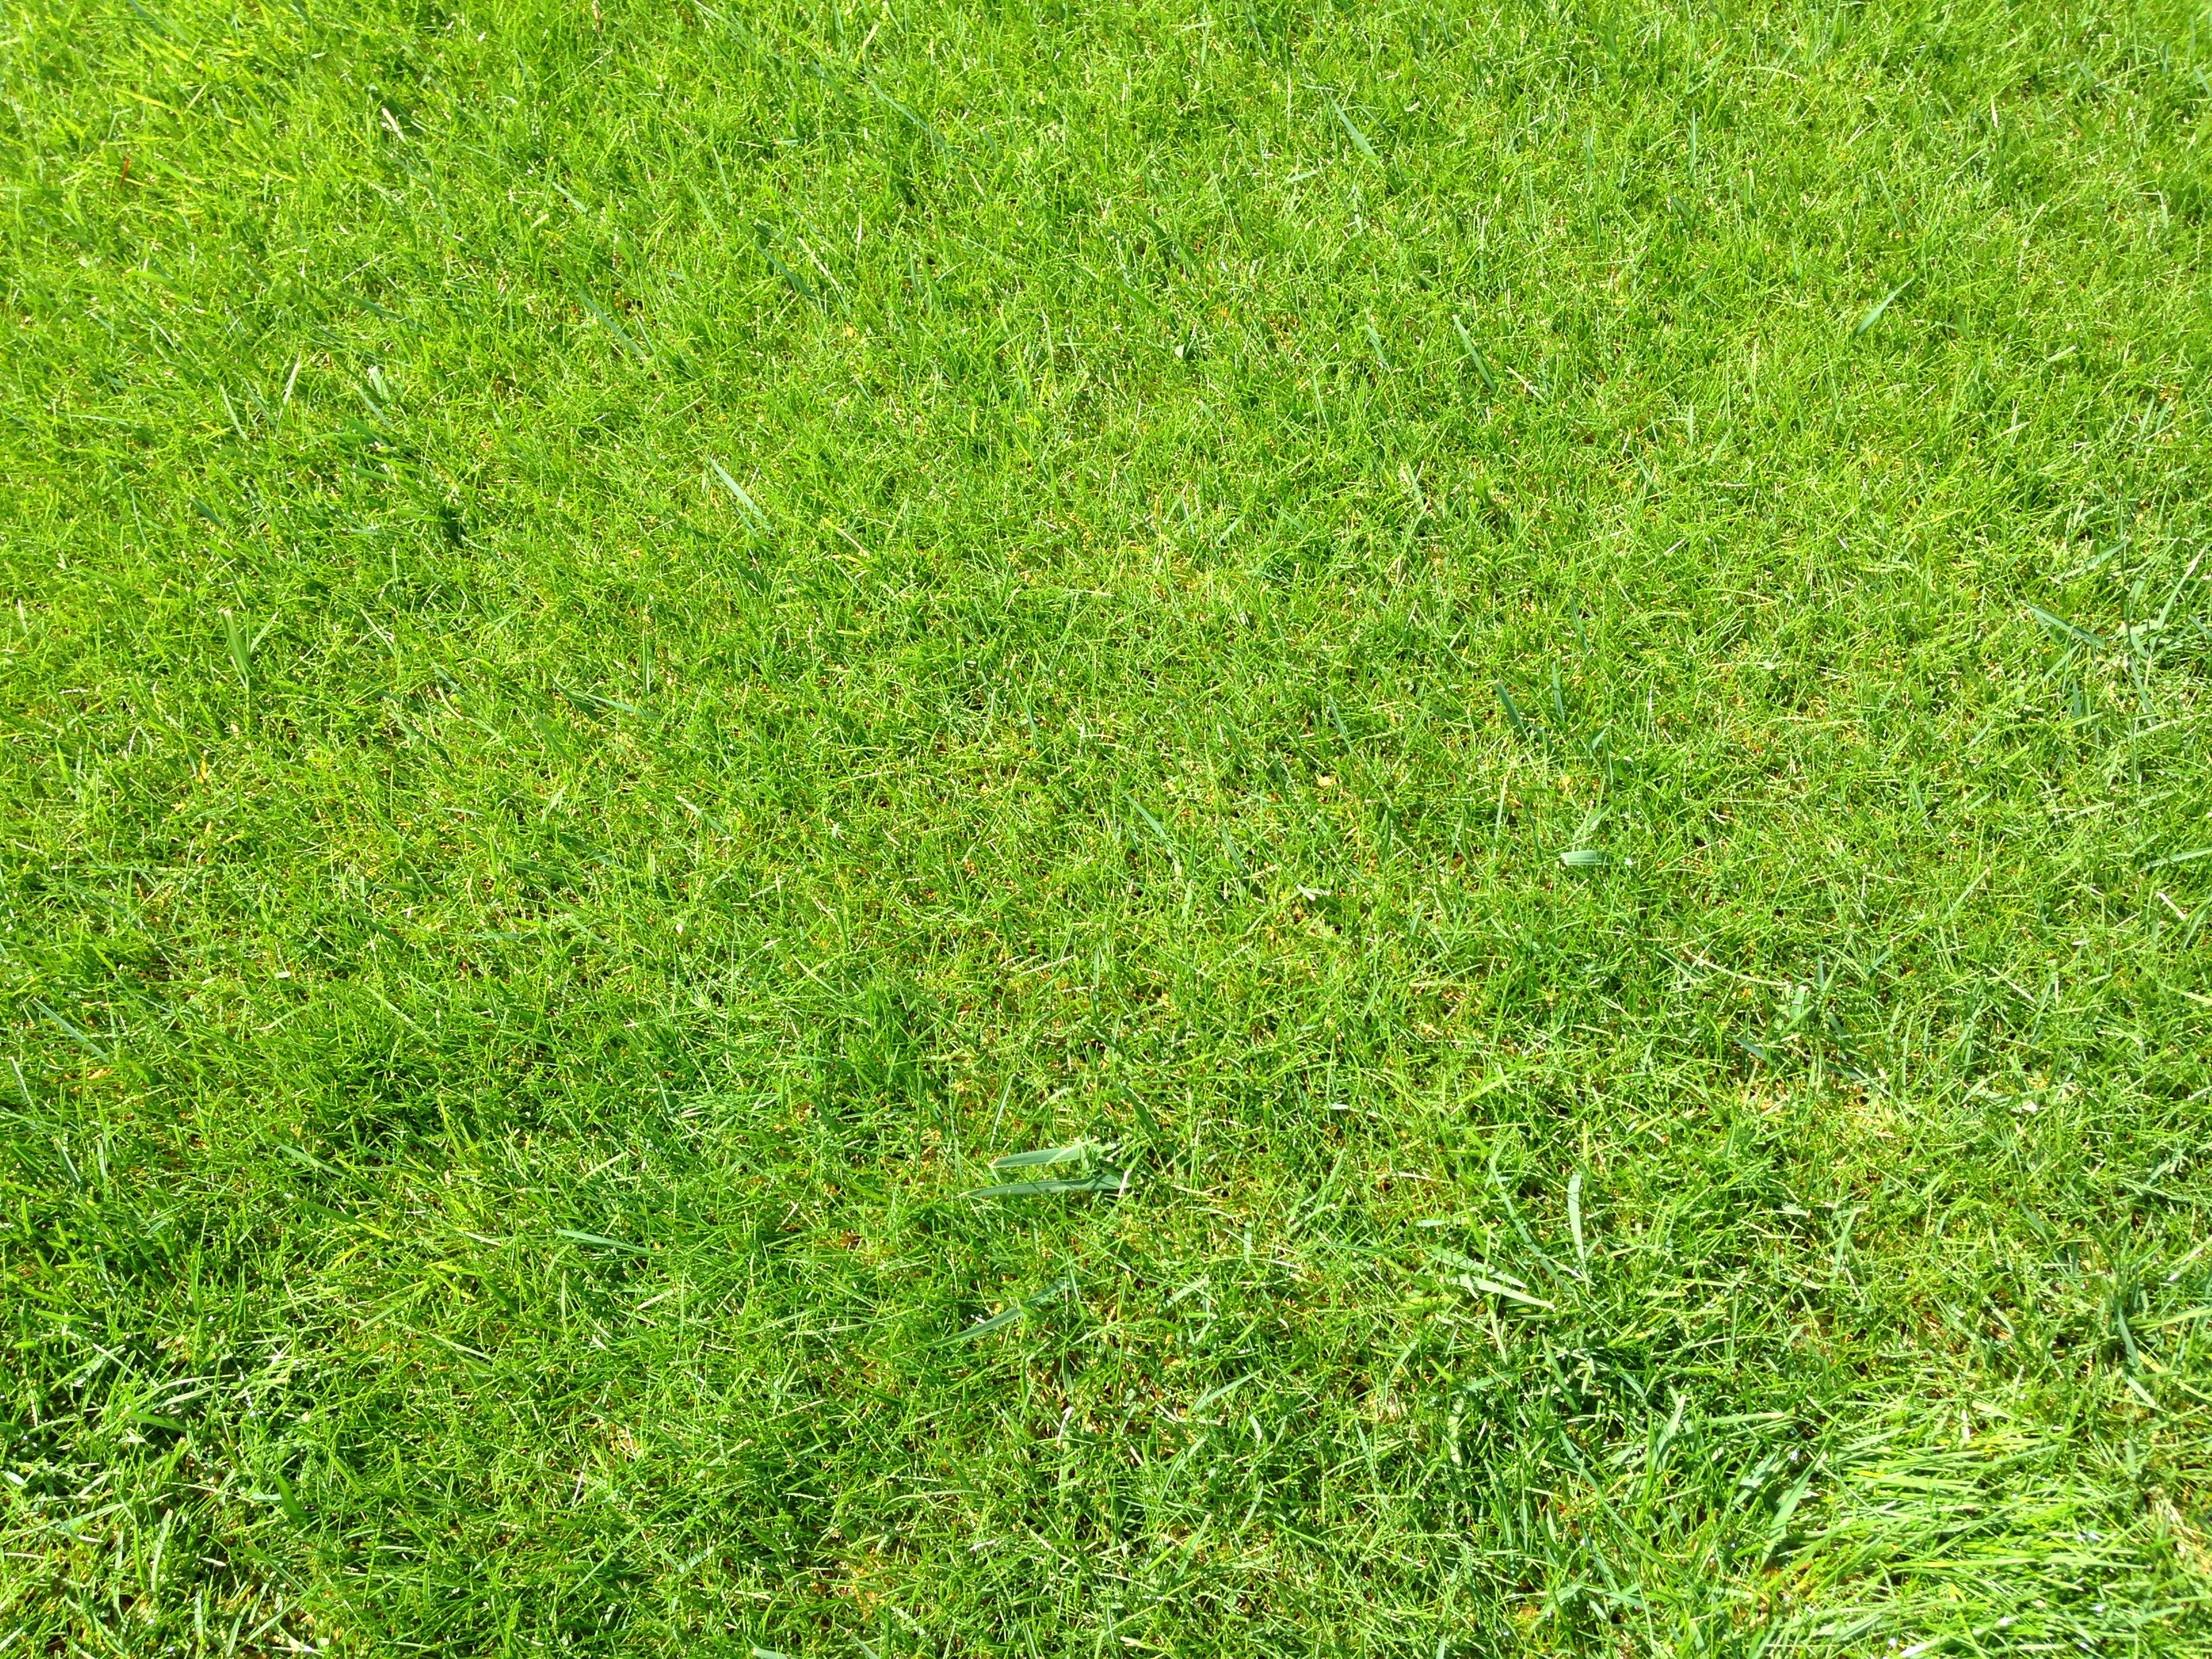 Tipos de cesped natural para jardin ideas de disenos for Como plantar cesped natural